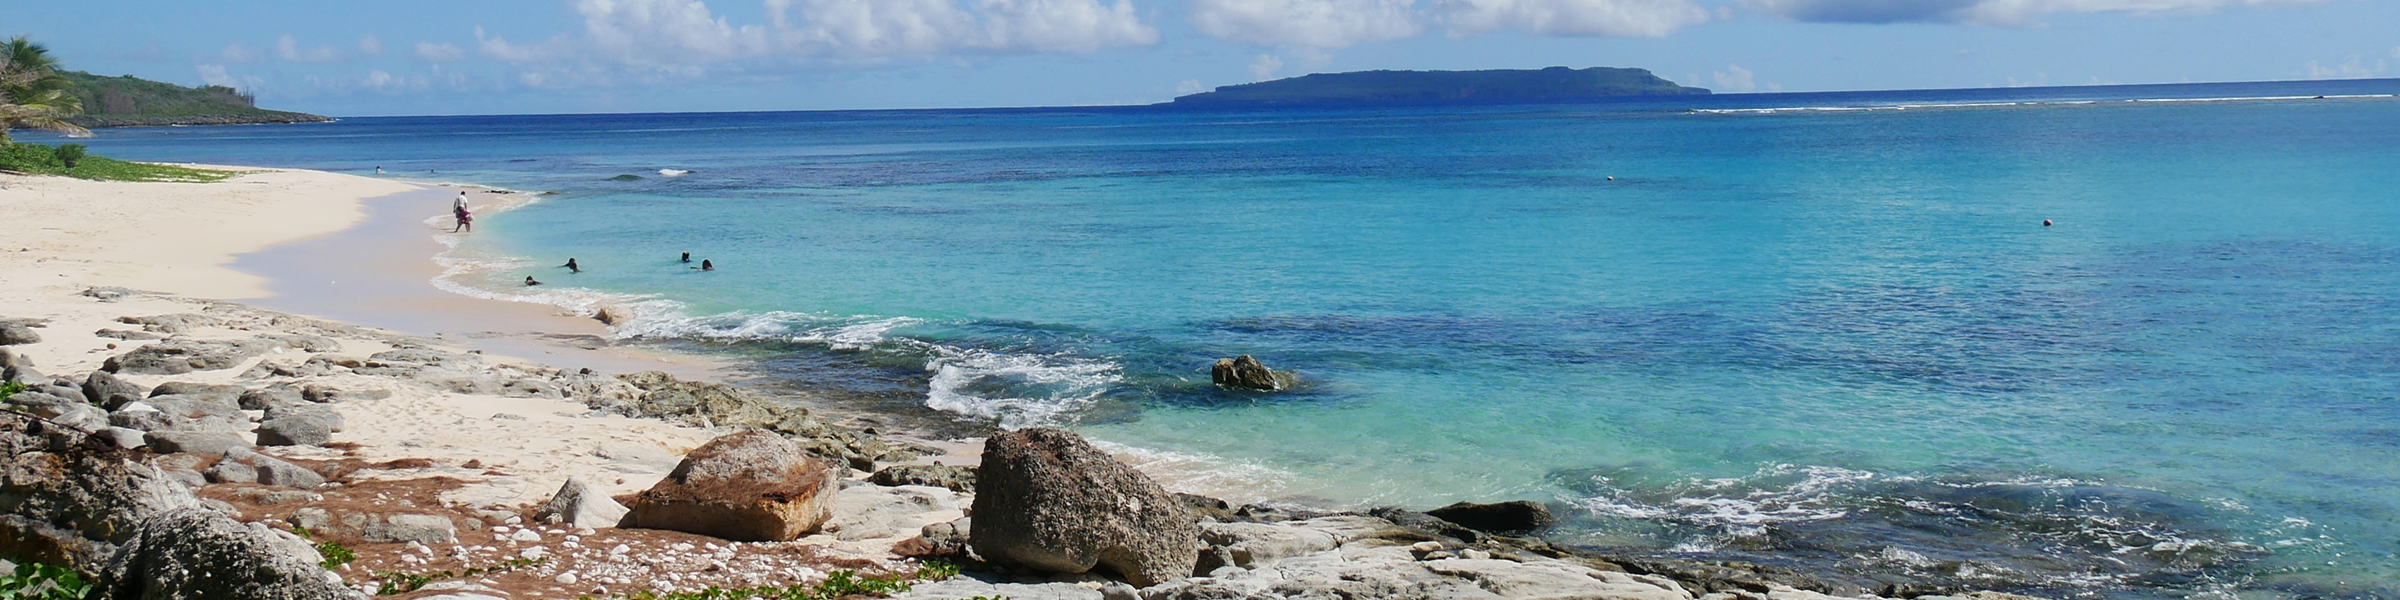 Northern Mariana Islands Beach